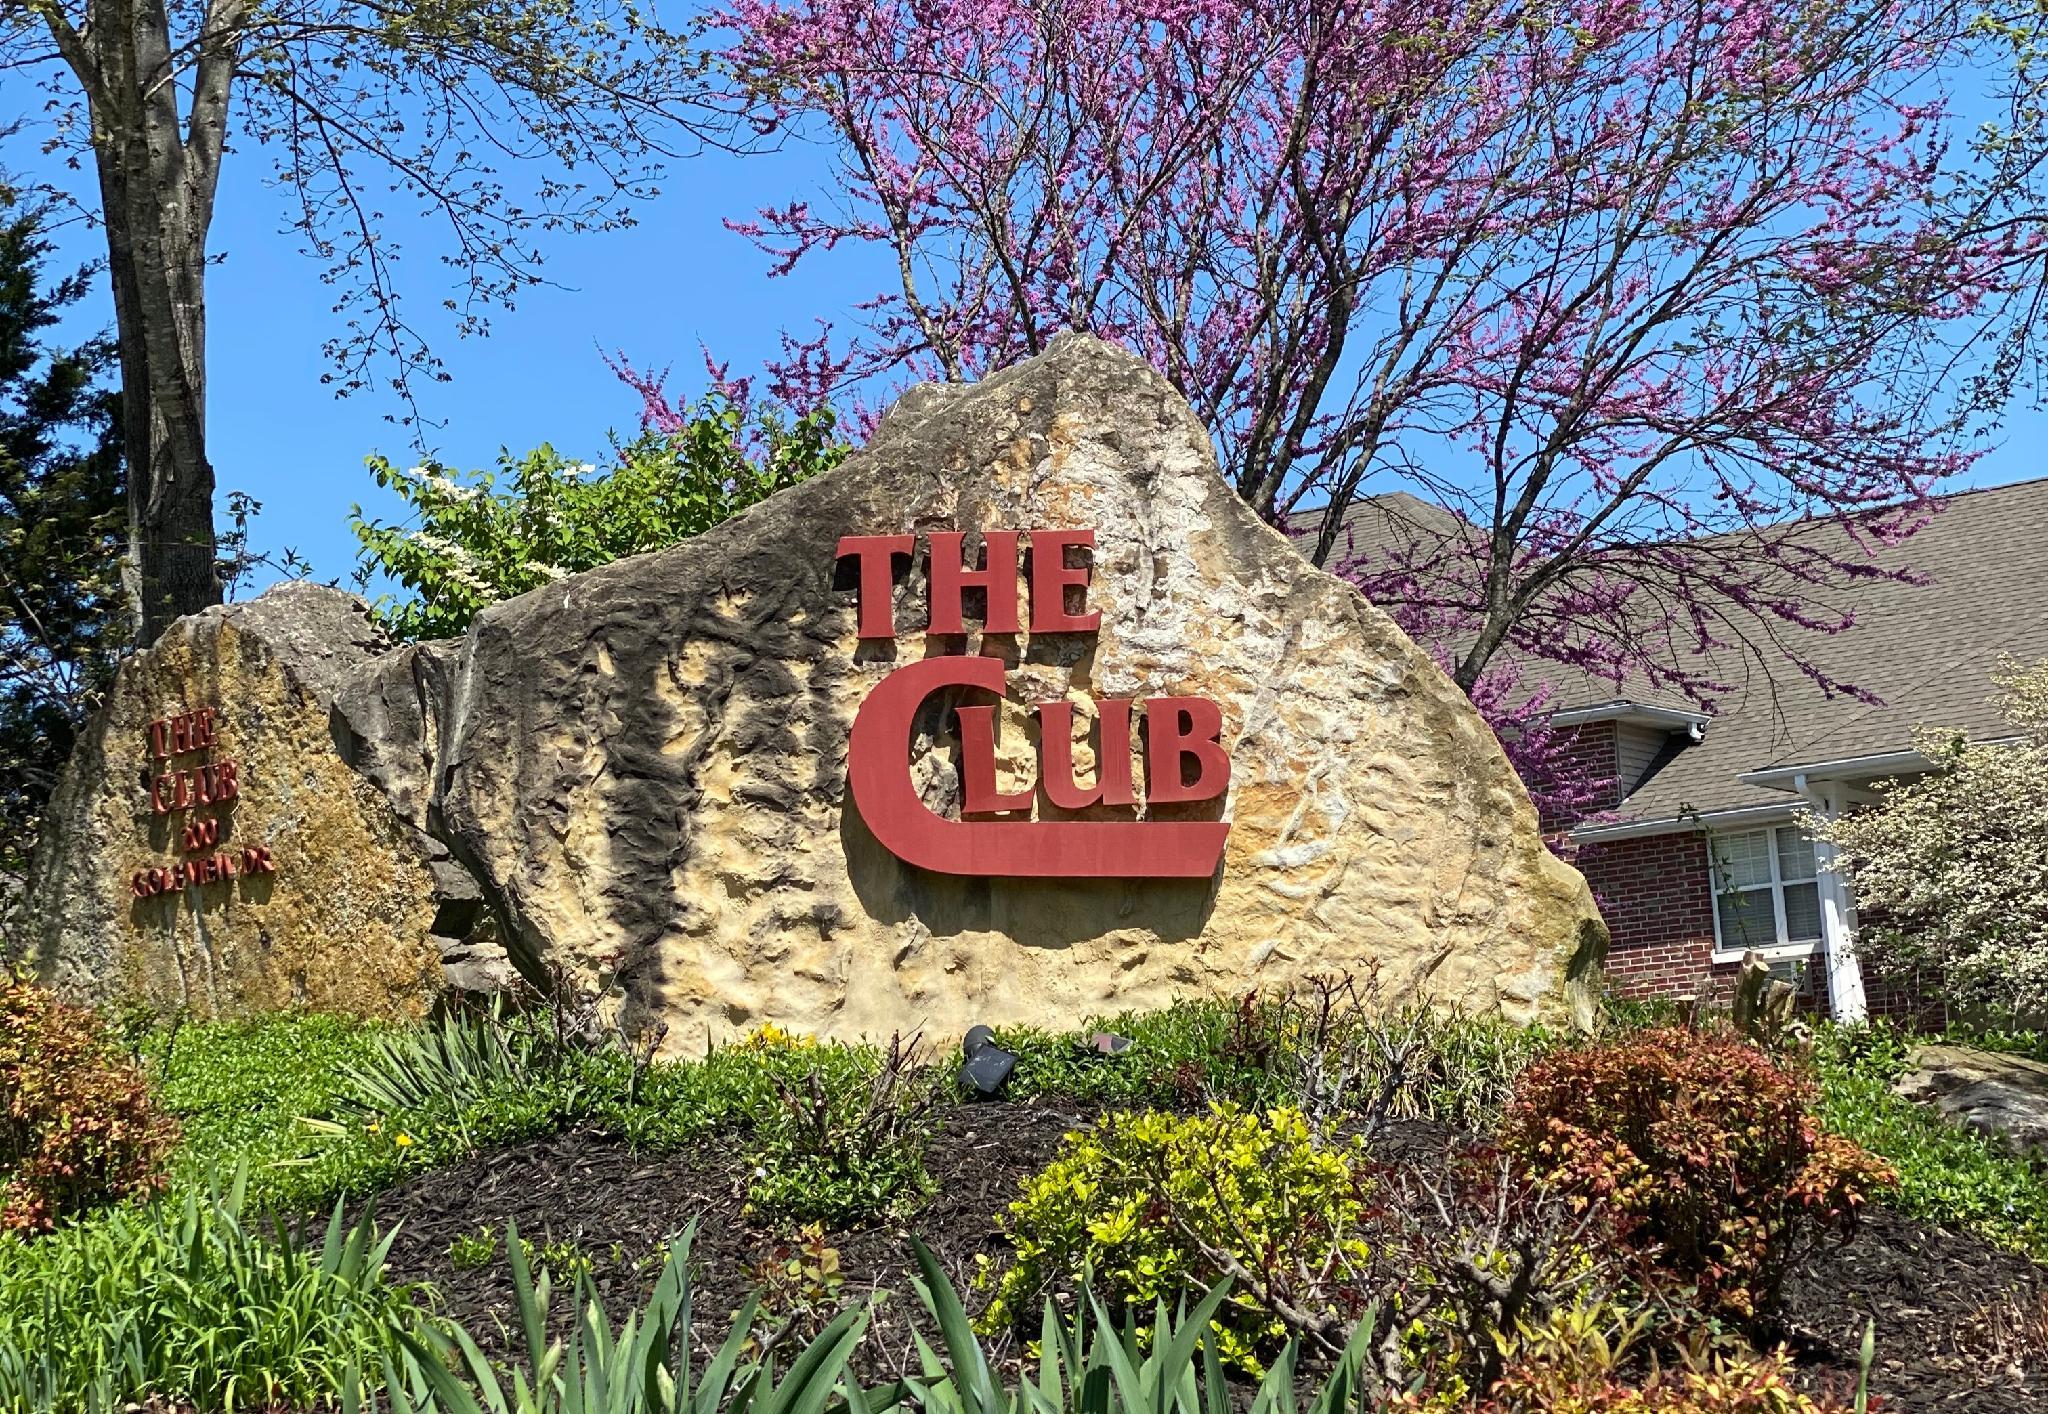 2 Bedroom Walk In Condo, Near the Strip, 1000 Hills Golf View, Sleeps 8 : Club A-5